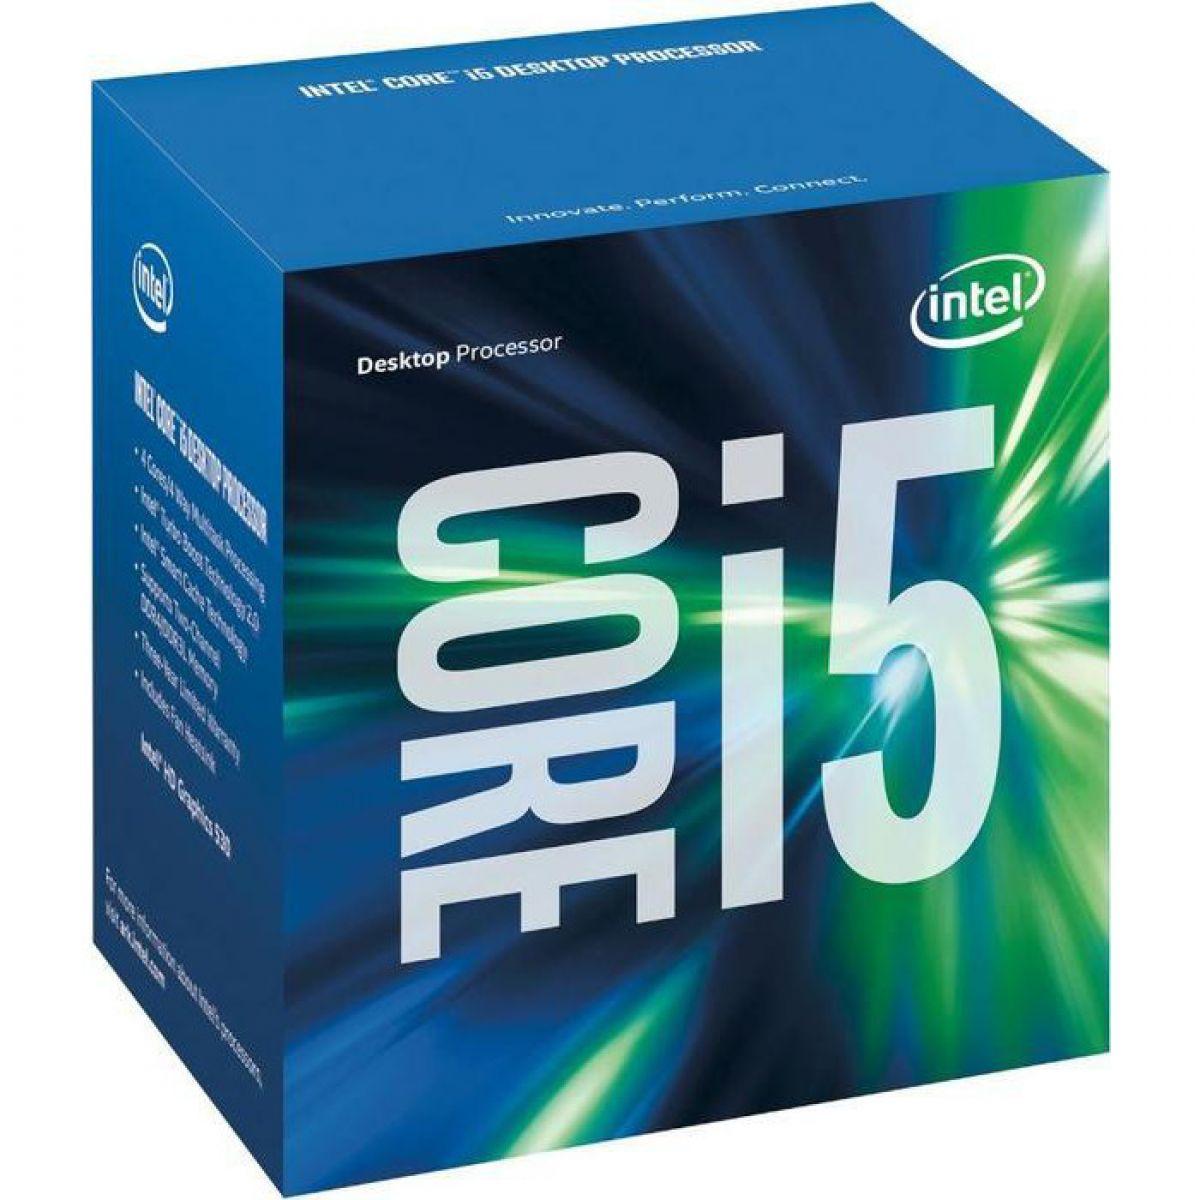 Procesor Intel Core i5-7600T